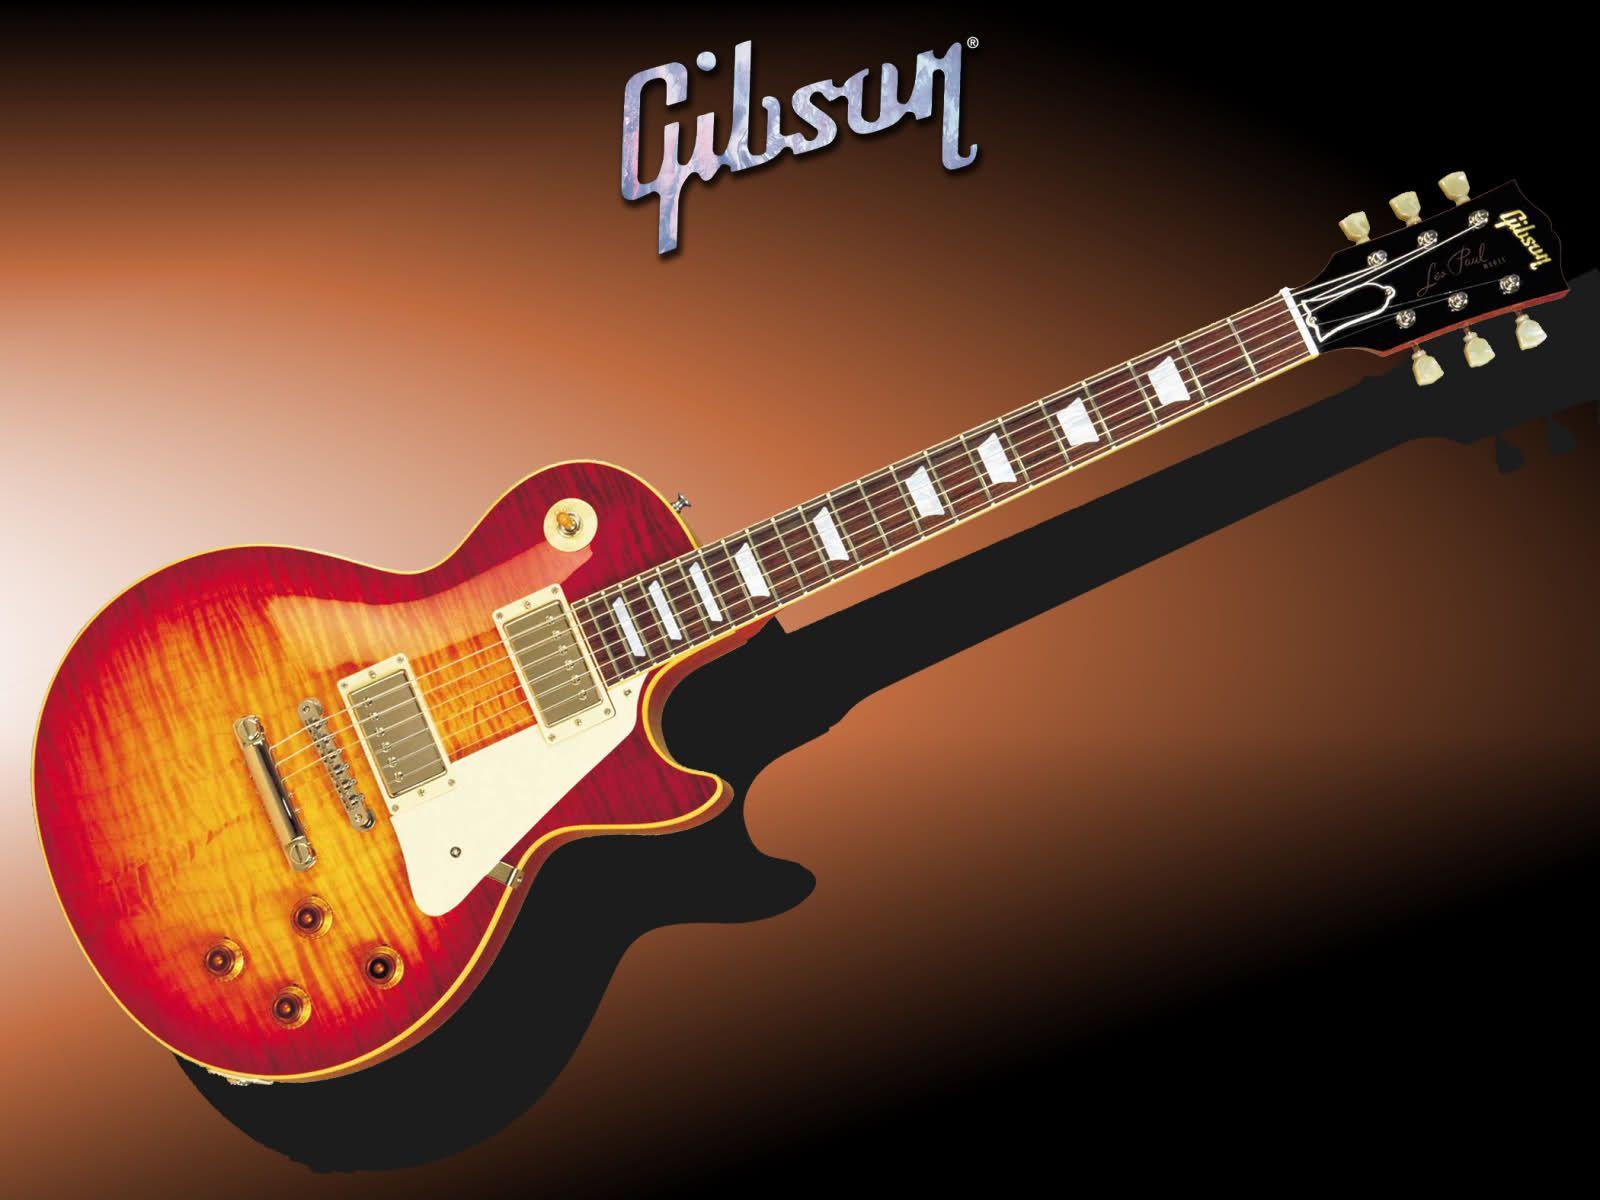 Gibson Les Paul Wallpaper Wallpaper Wide Hd Guitars And